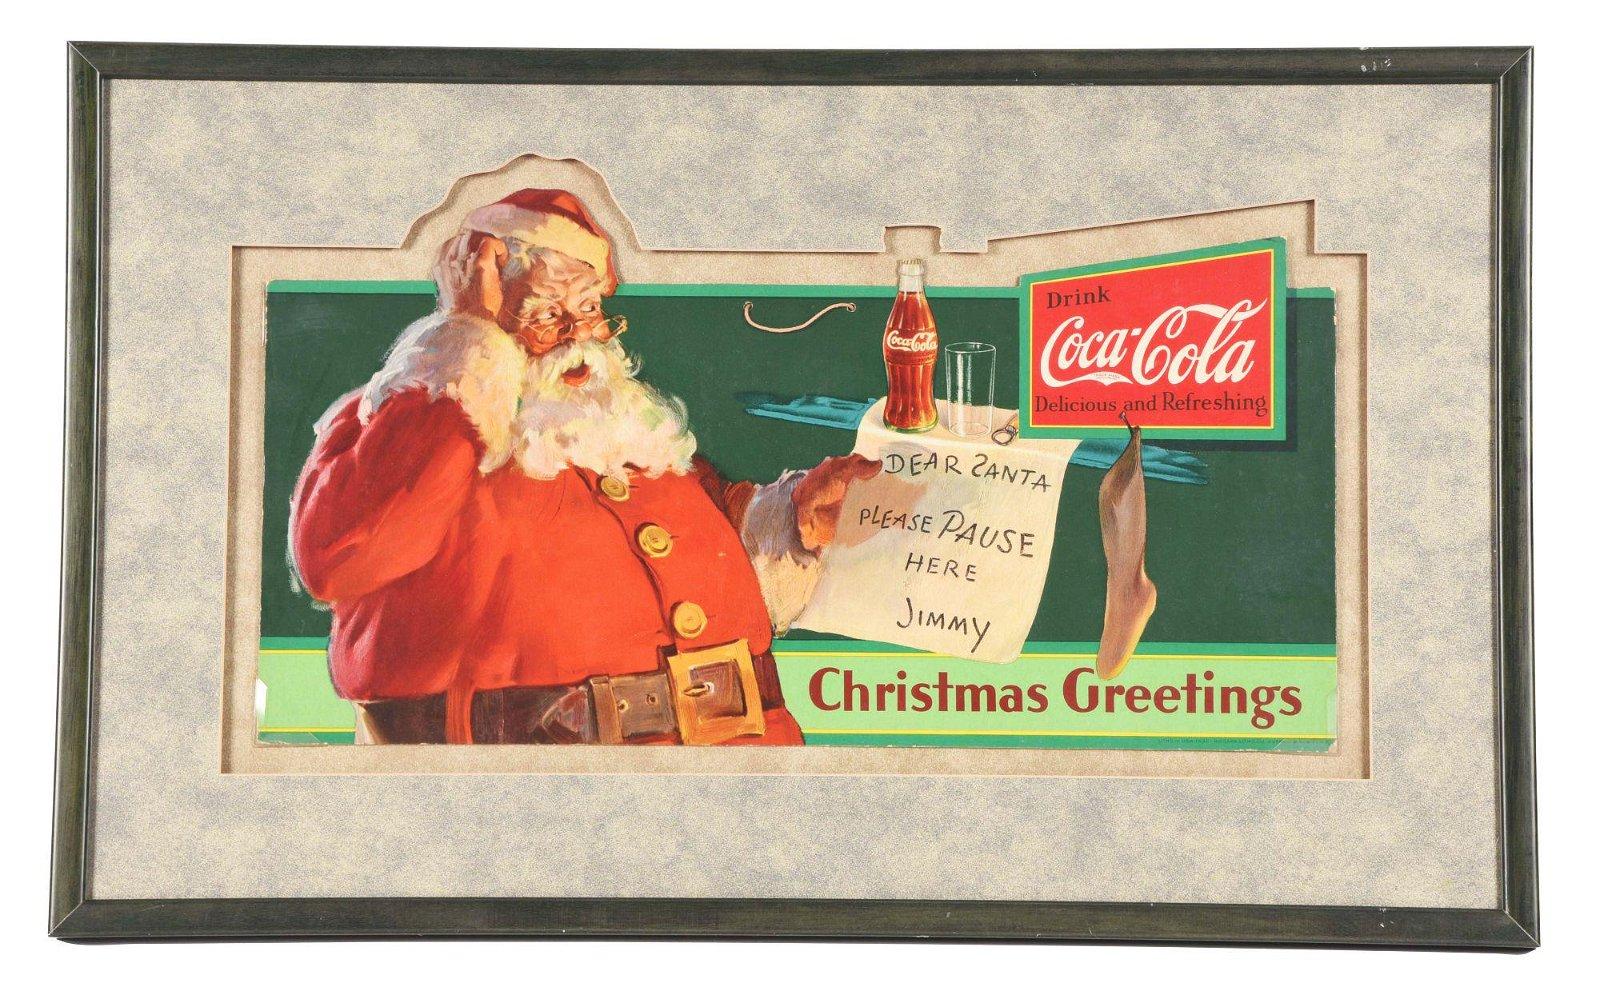 FRAMED COCA-COLA CHRISTMAS GREETINGS AD.